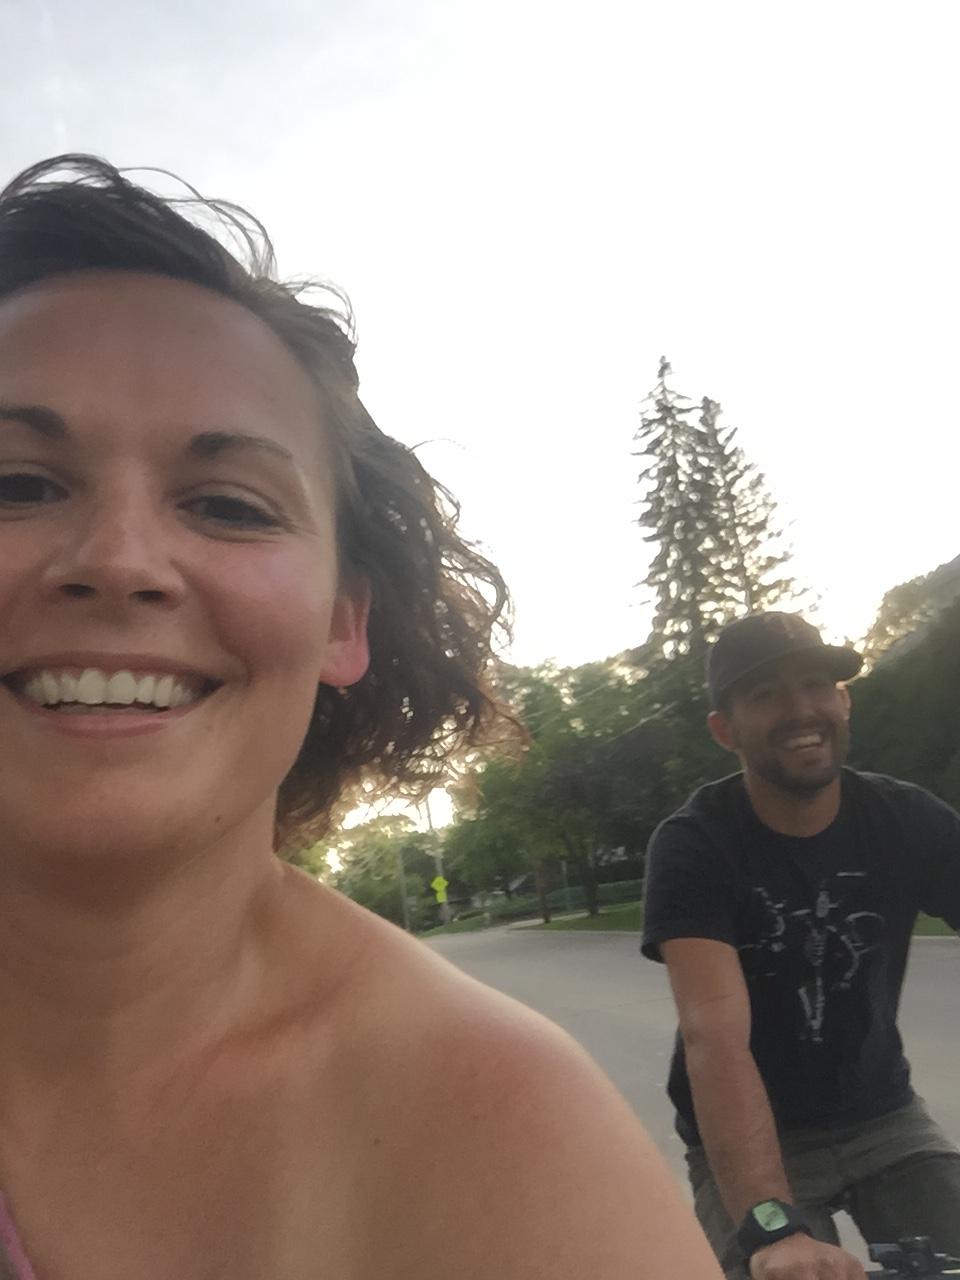 DATE NIGHT ON BIKES | CEDAR FALLS, IA